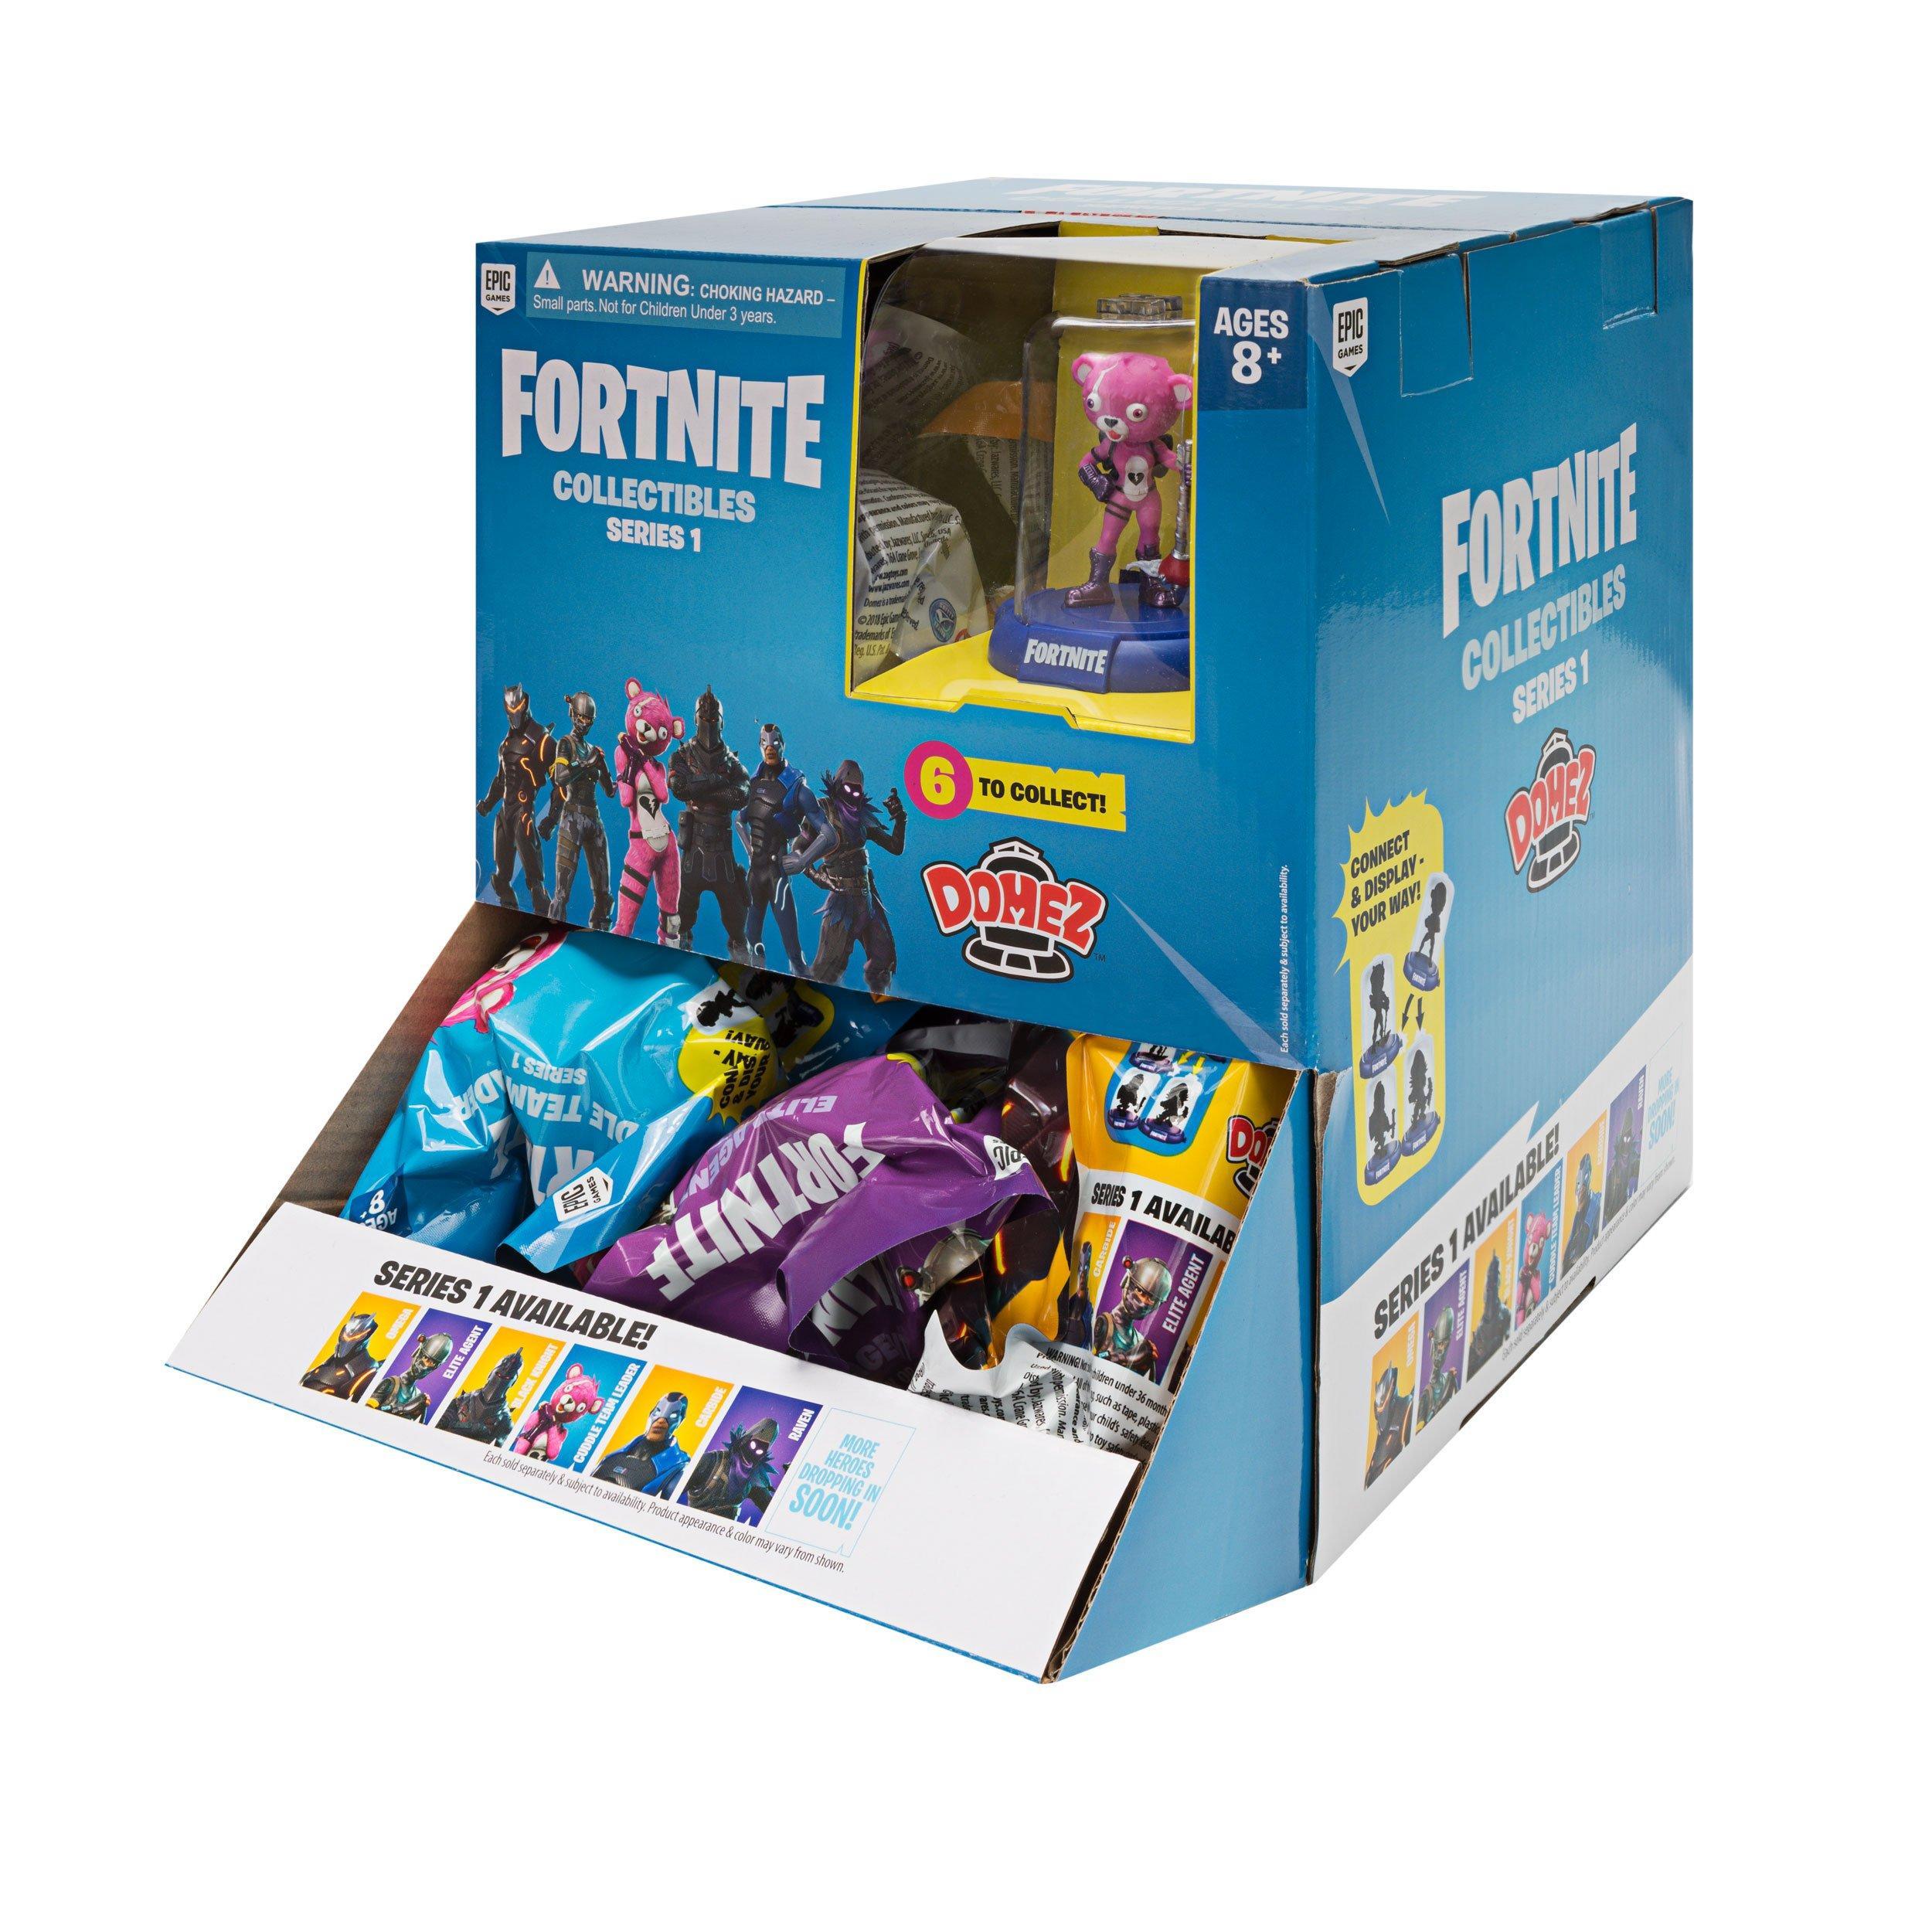 Domez Fortnite Series 1 Blind Box Figure Gamestop